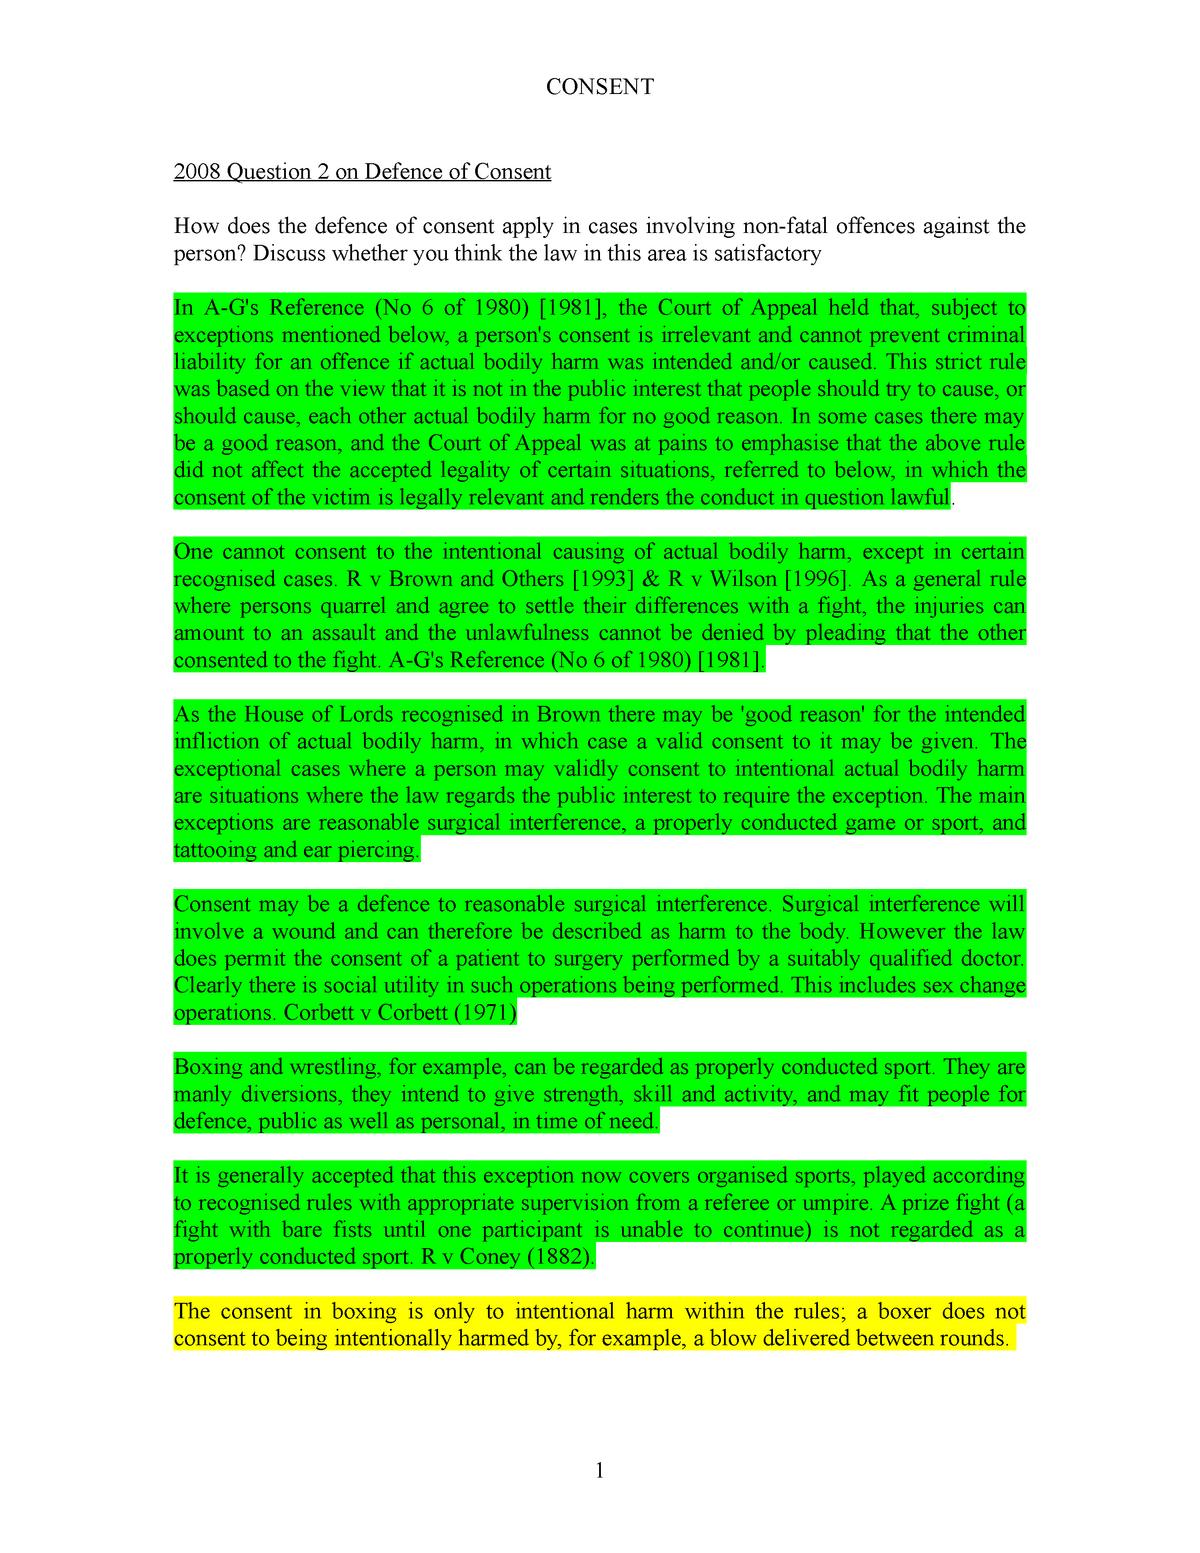 Consent - Criminal law LA1010 - StuDocu